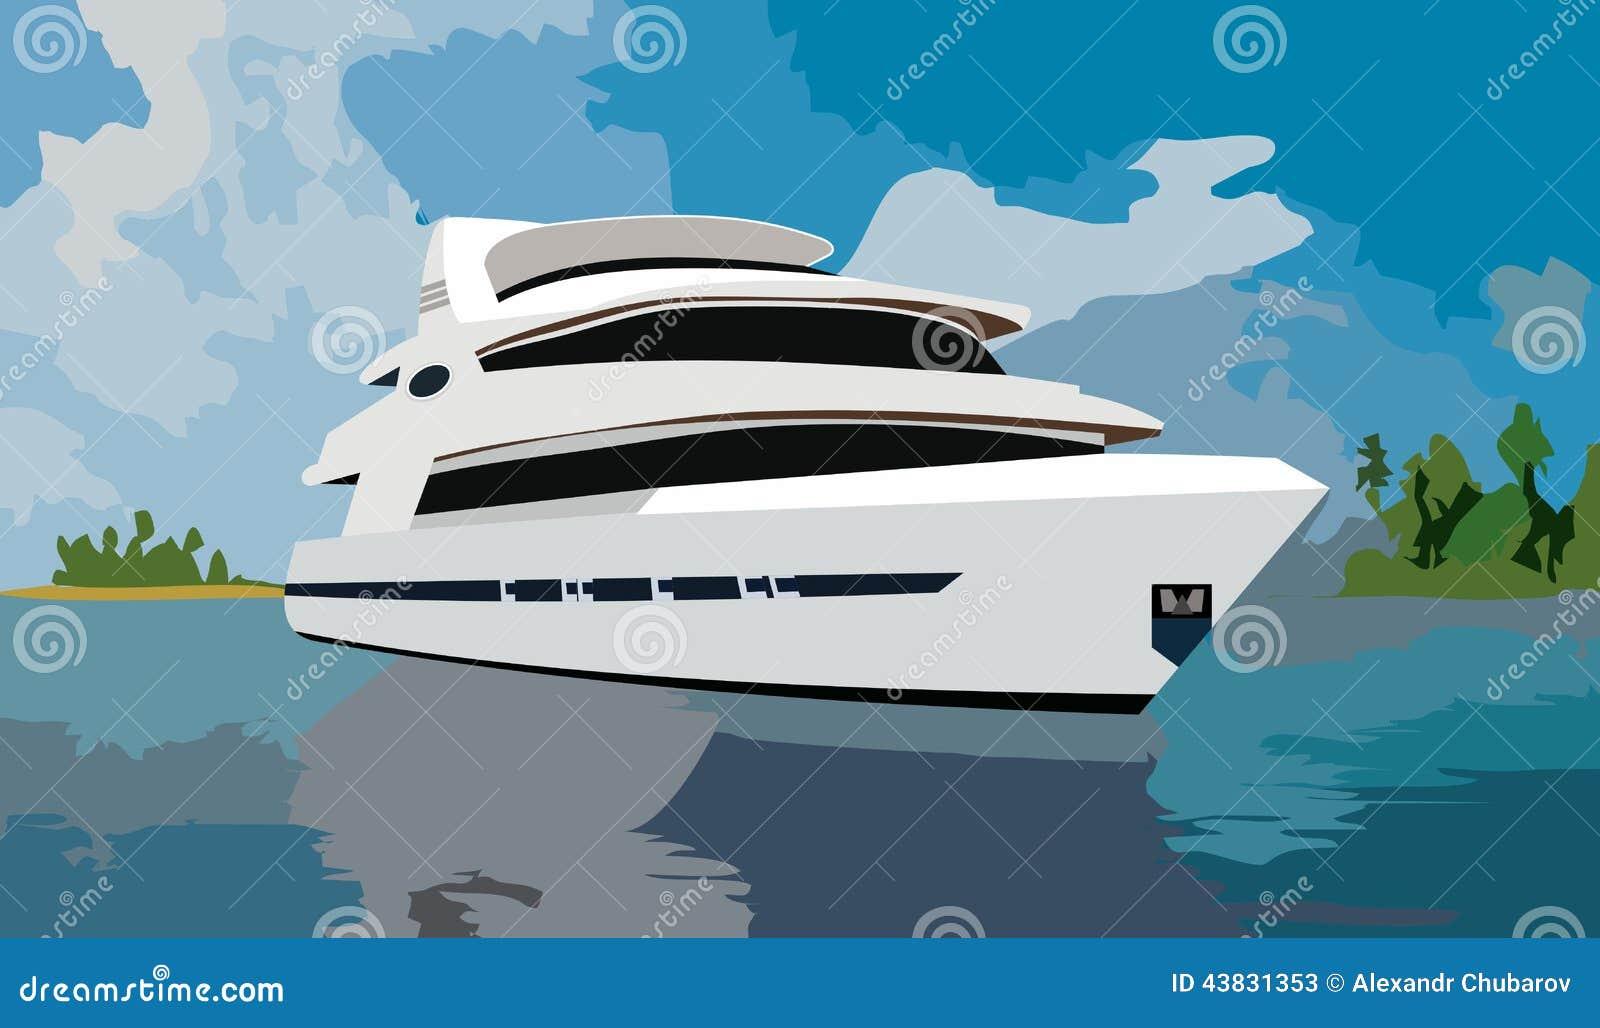 Ogromny jacht